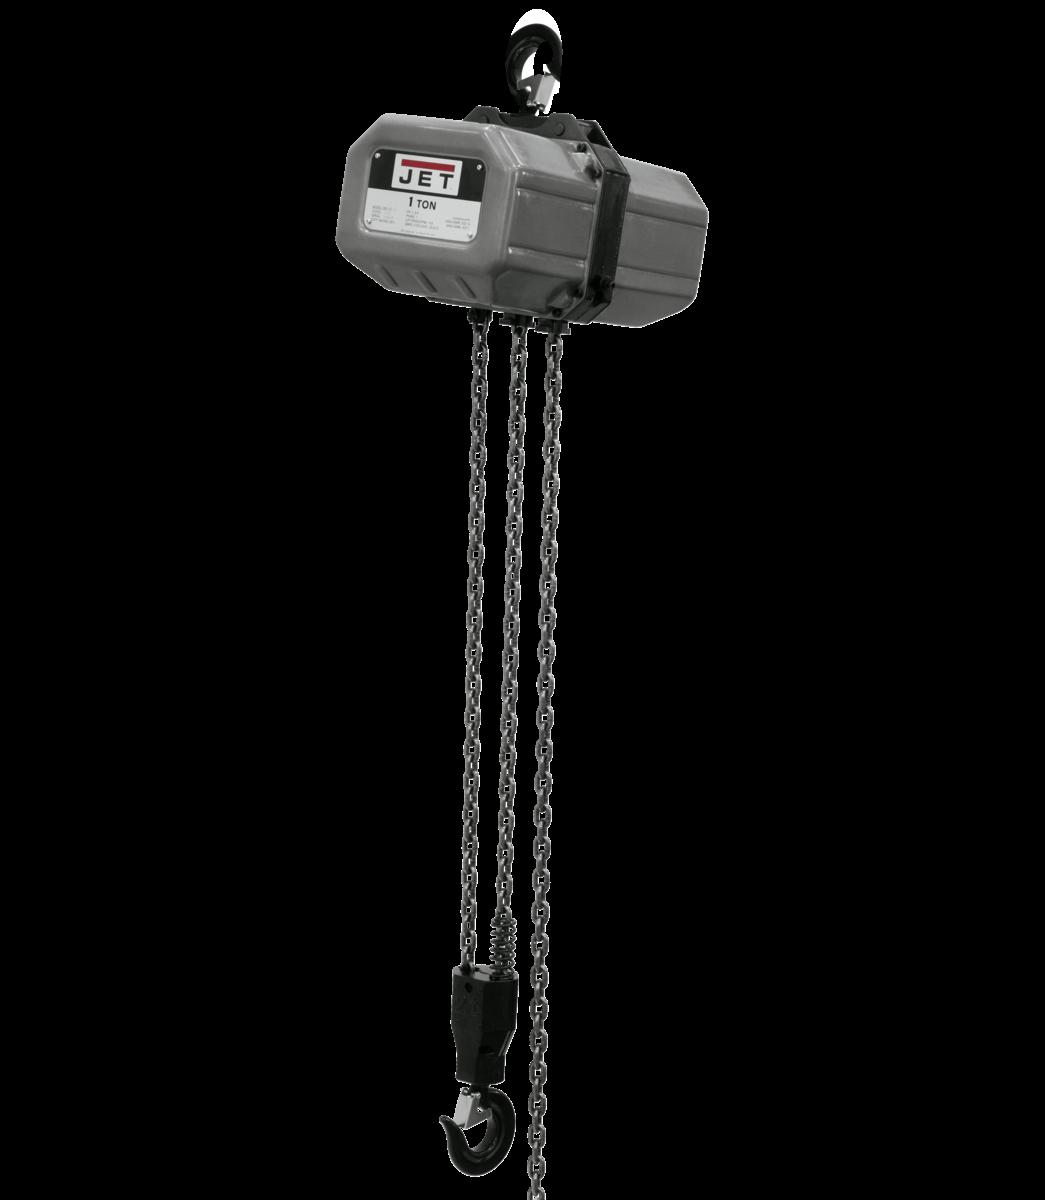 1SS-1C-10, 1-Ton Electric Chain Hoist 1-Phase 10' Lift